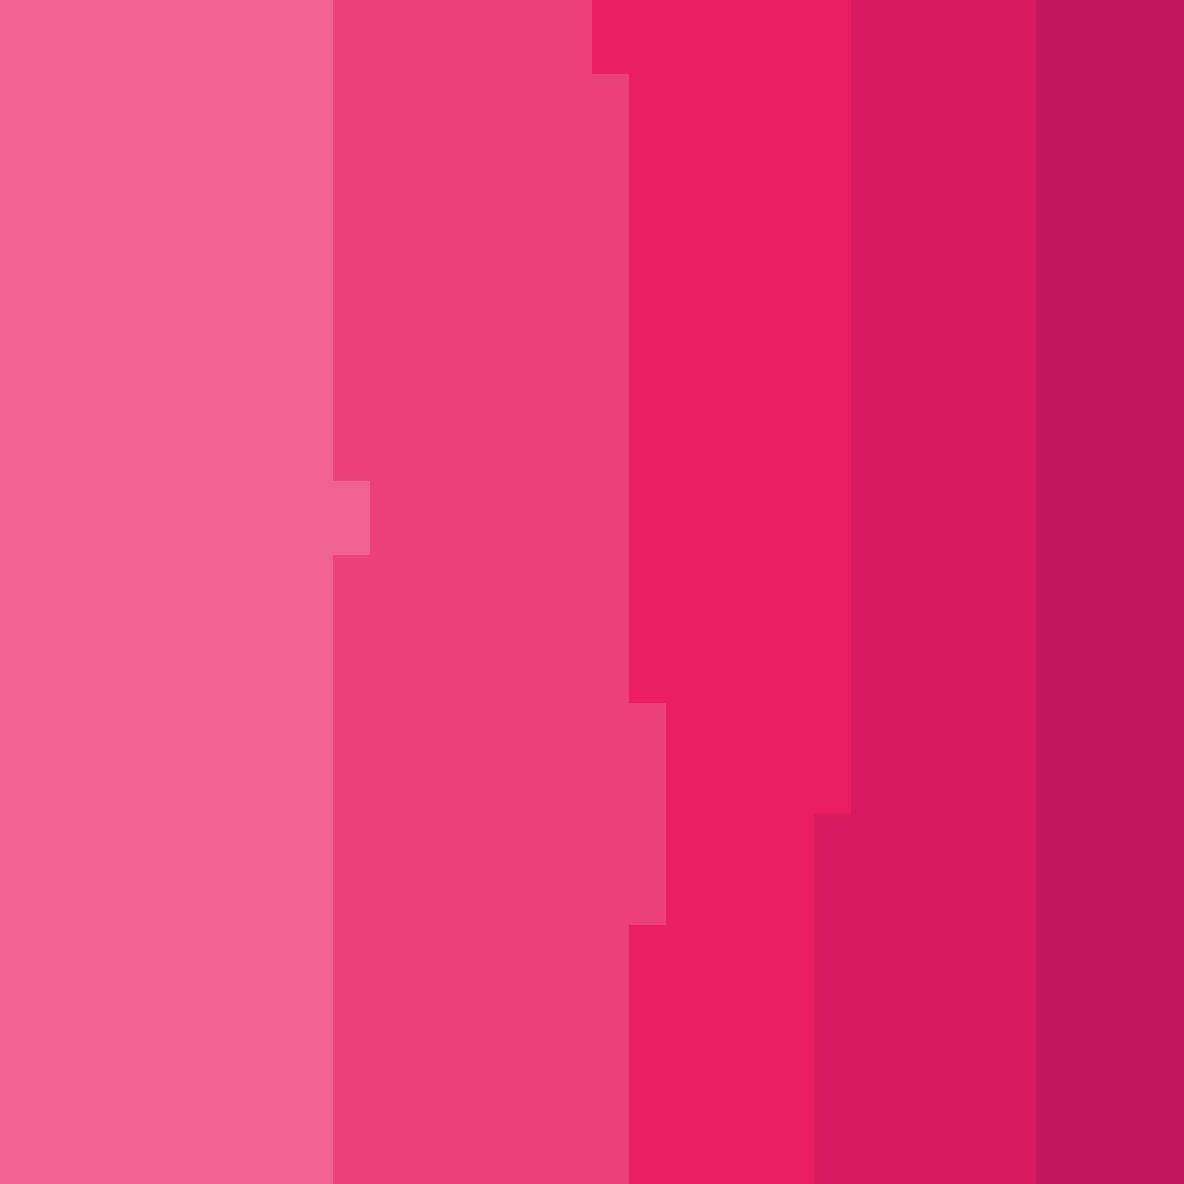 pink love  by brettpayne